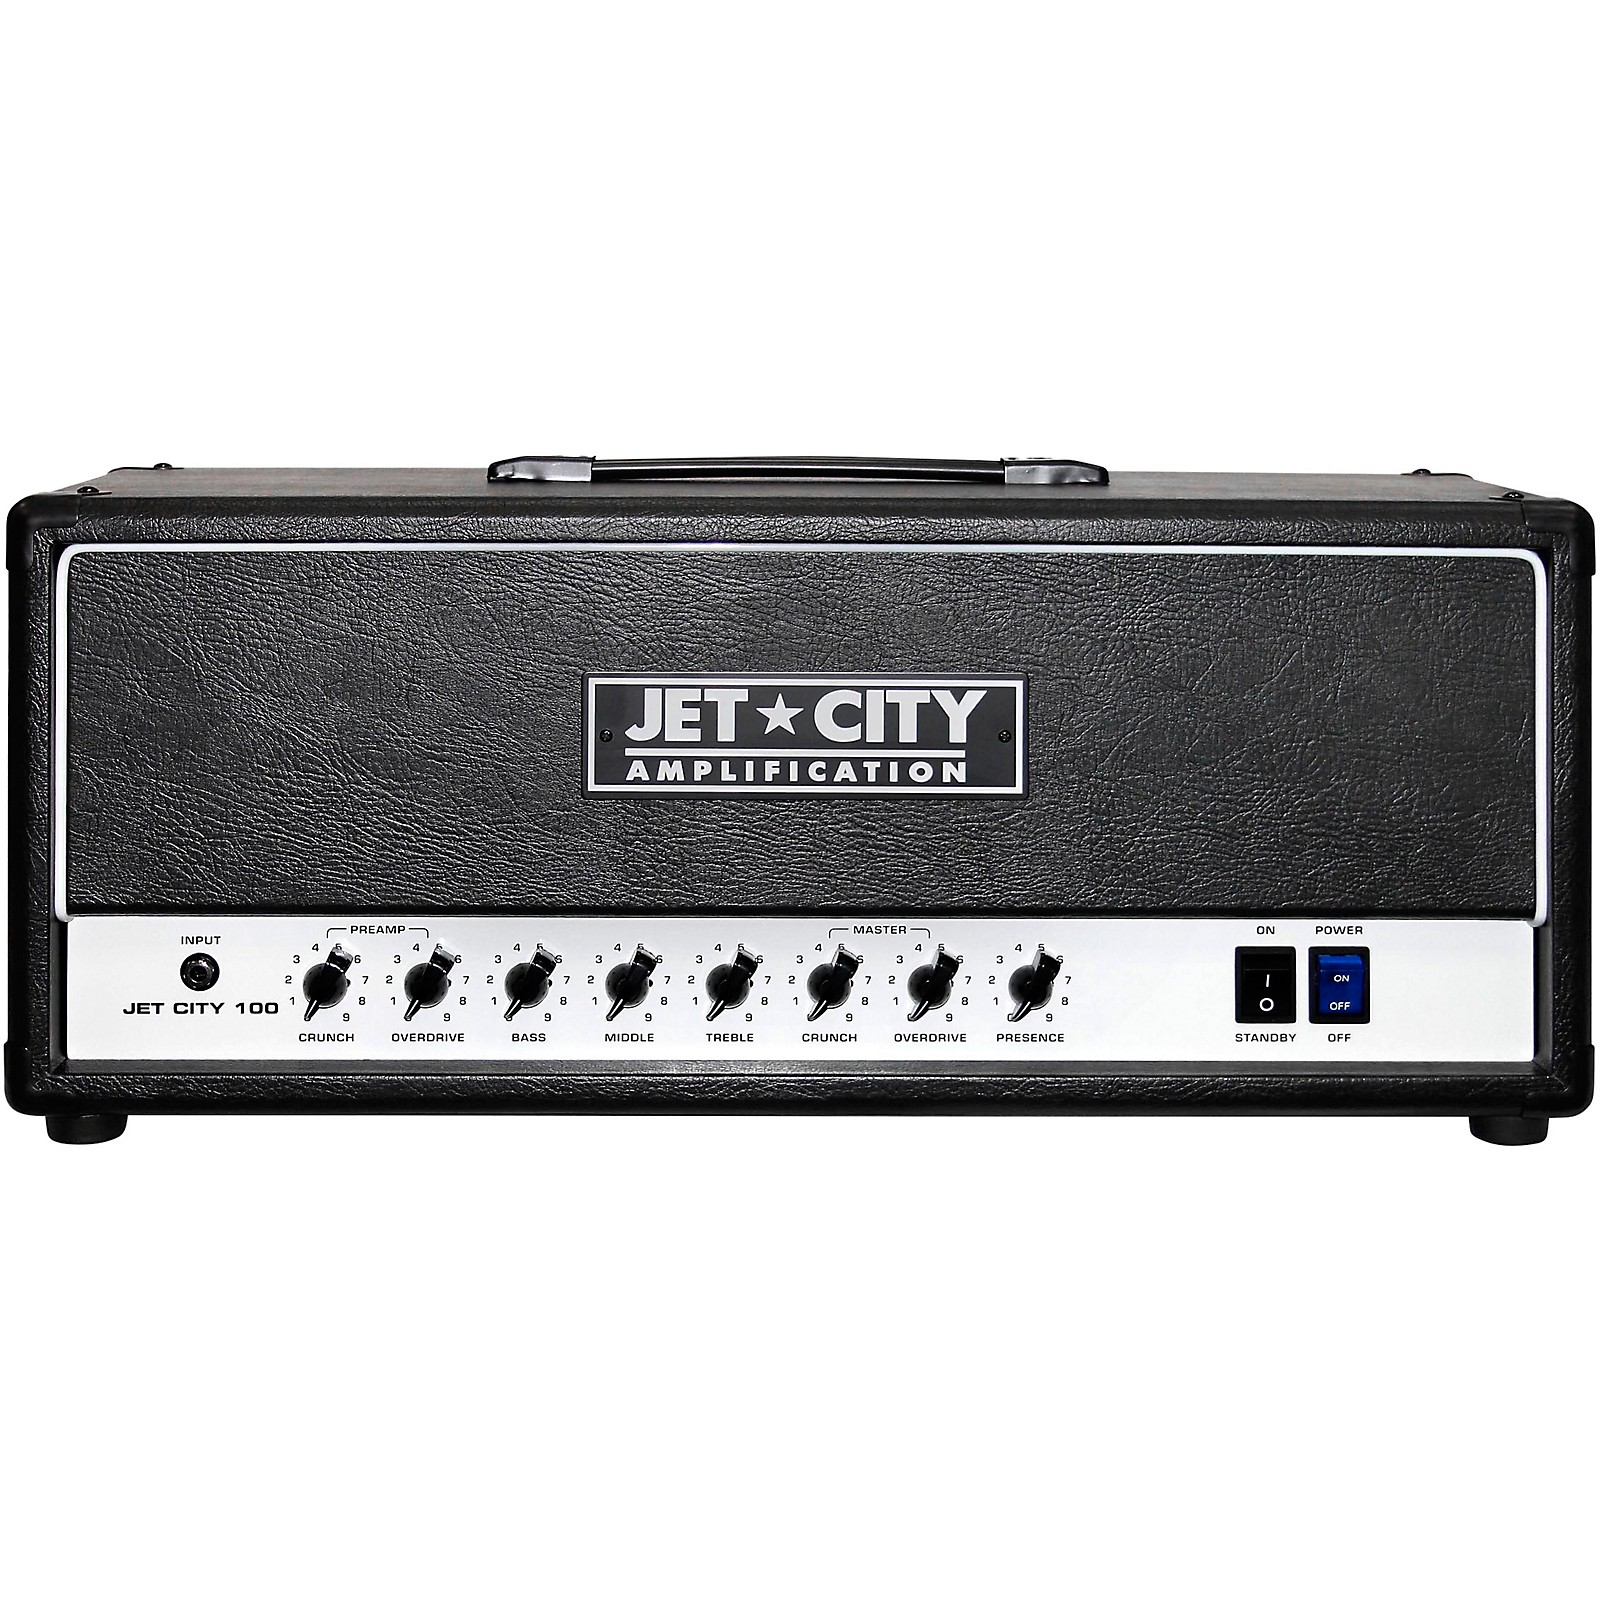 Jet City Amplification 100H LTD 100W Tube Guitar Amp Head